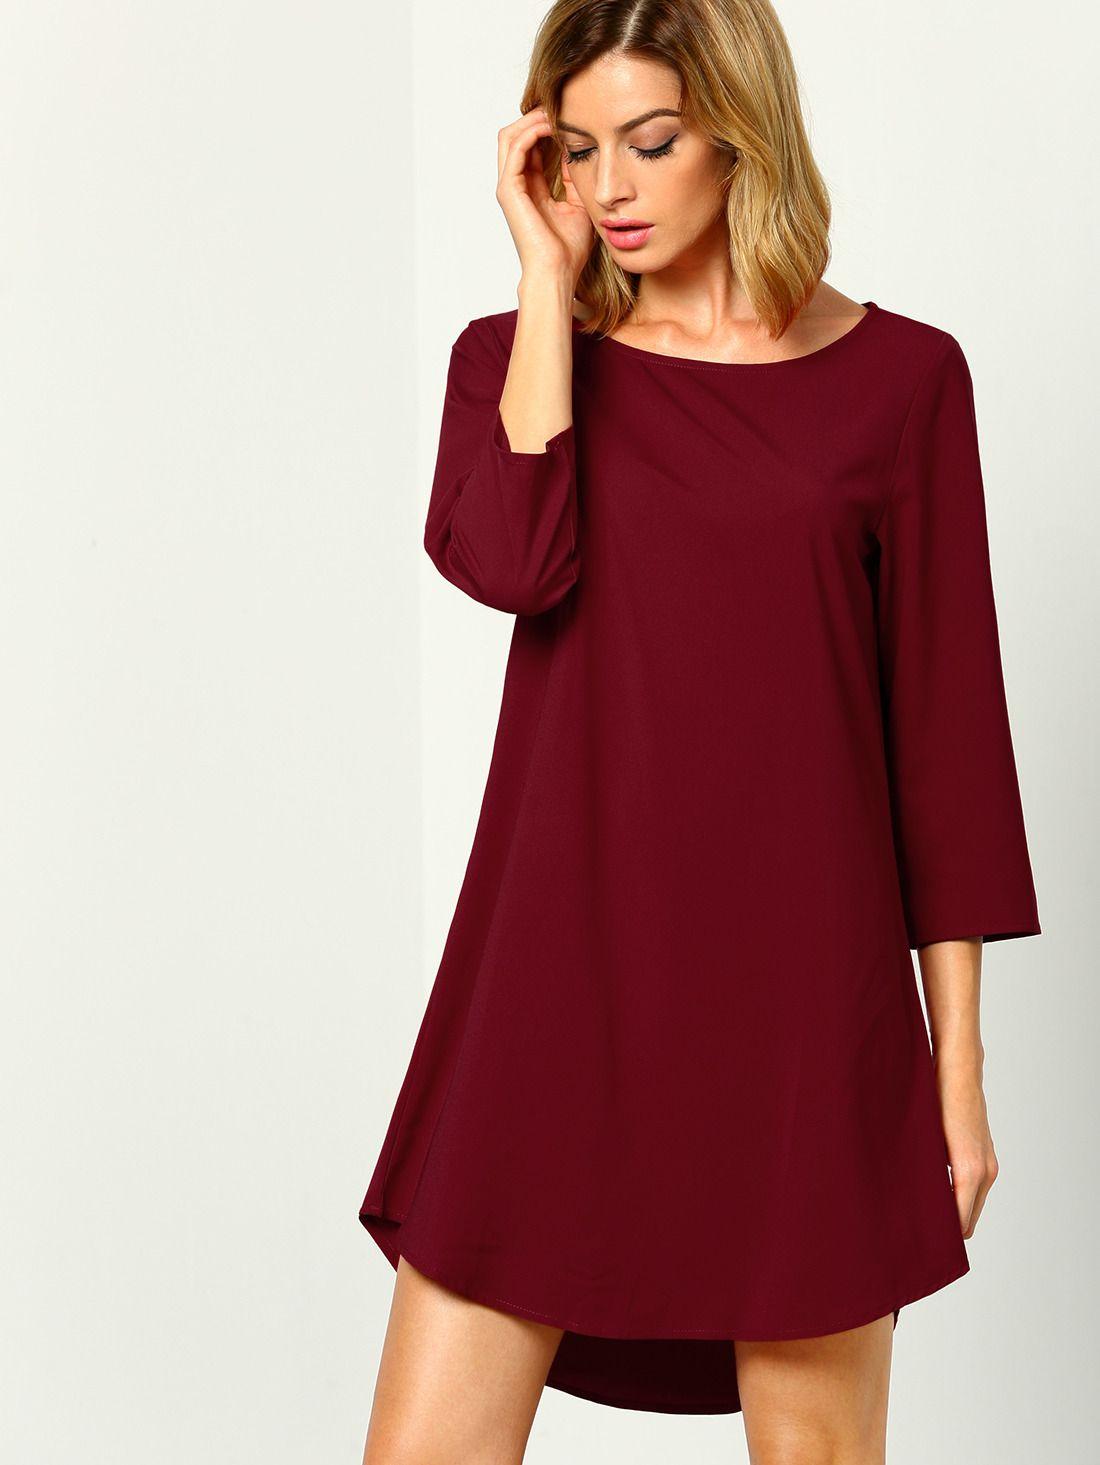 Wine Red Burgandy Elbow Length Sleeve High Low Dress Makemechic Com Long Sleeve Casual Dress Elbow Length Sleeve Dress Long Sleeve Bridesmaid Dress [ 1465 x 1100 Pixel ]